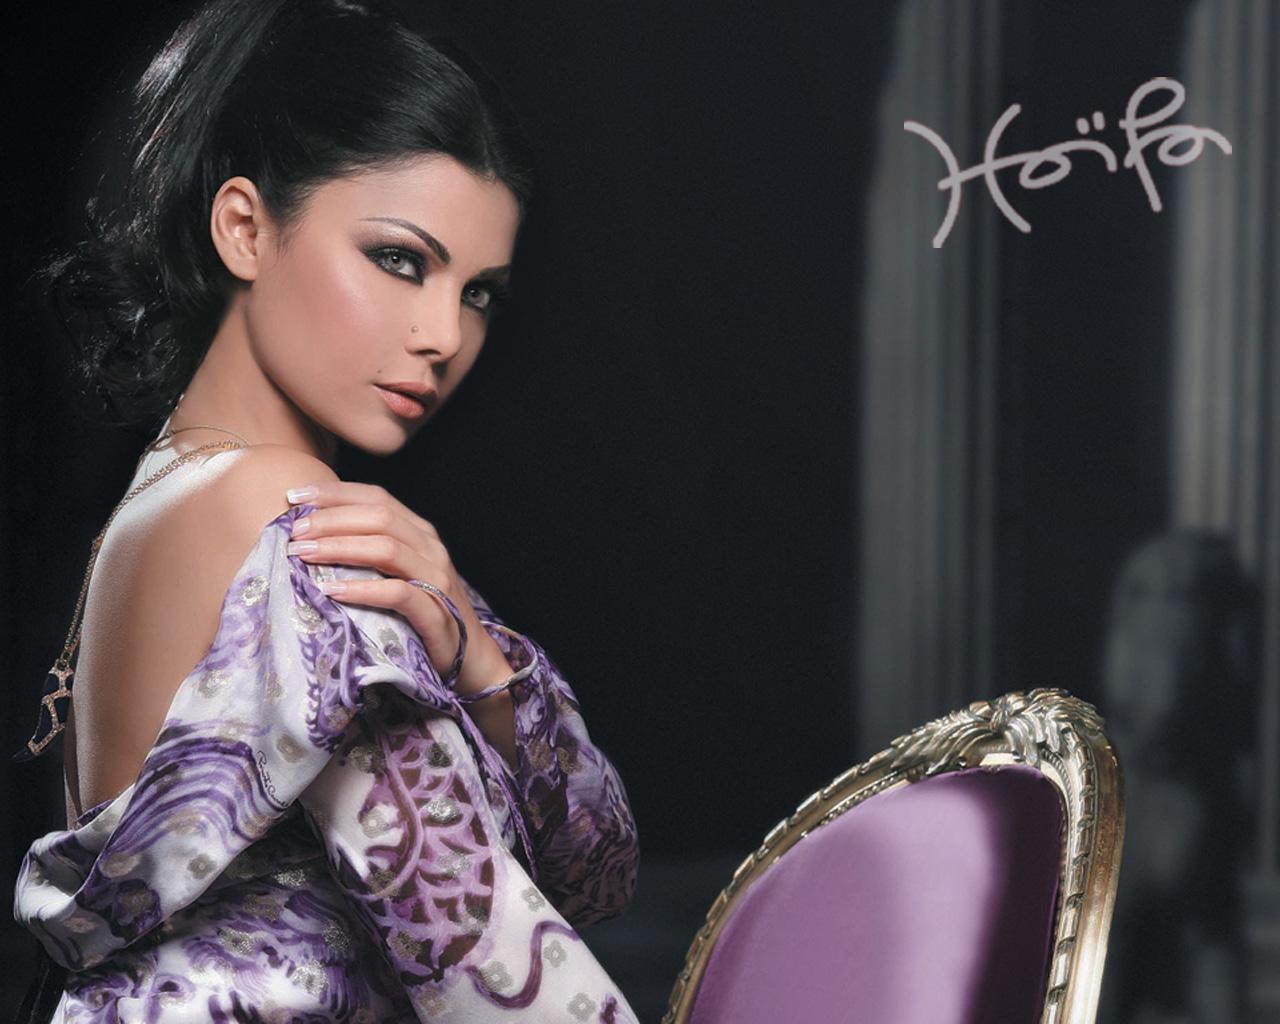 12 Haifa Wehbe Wallpapers-5879